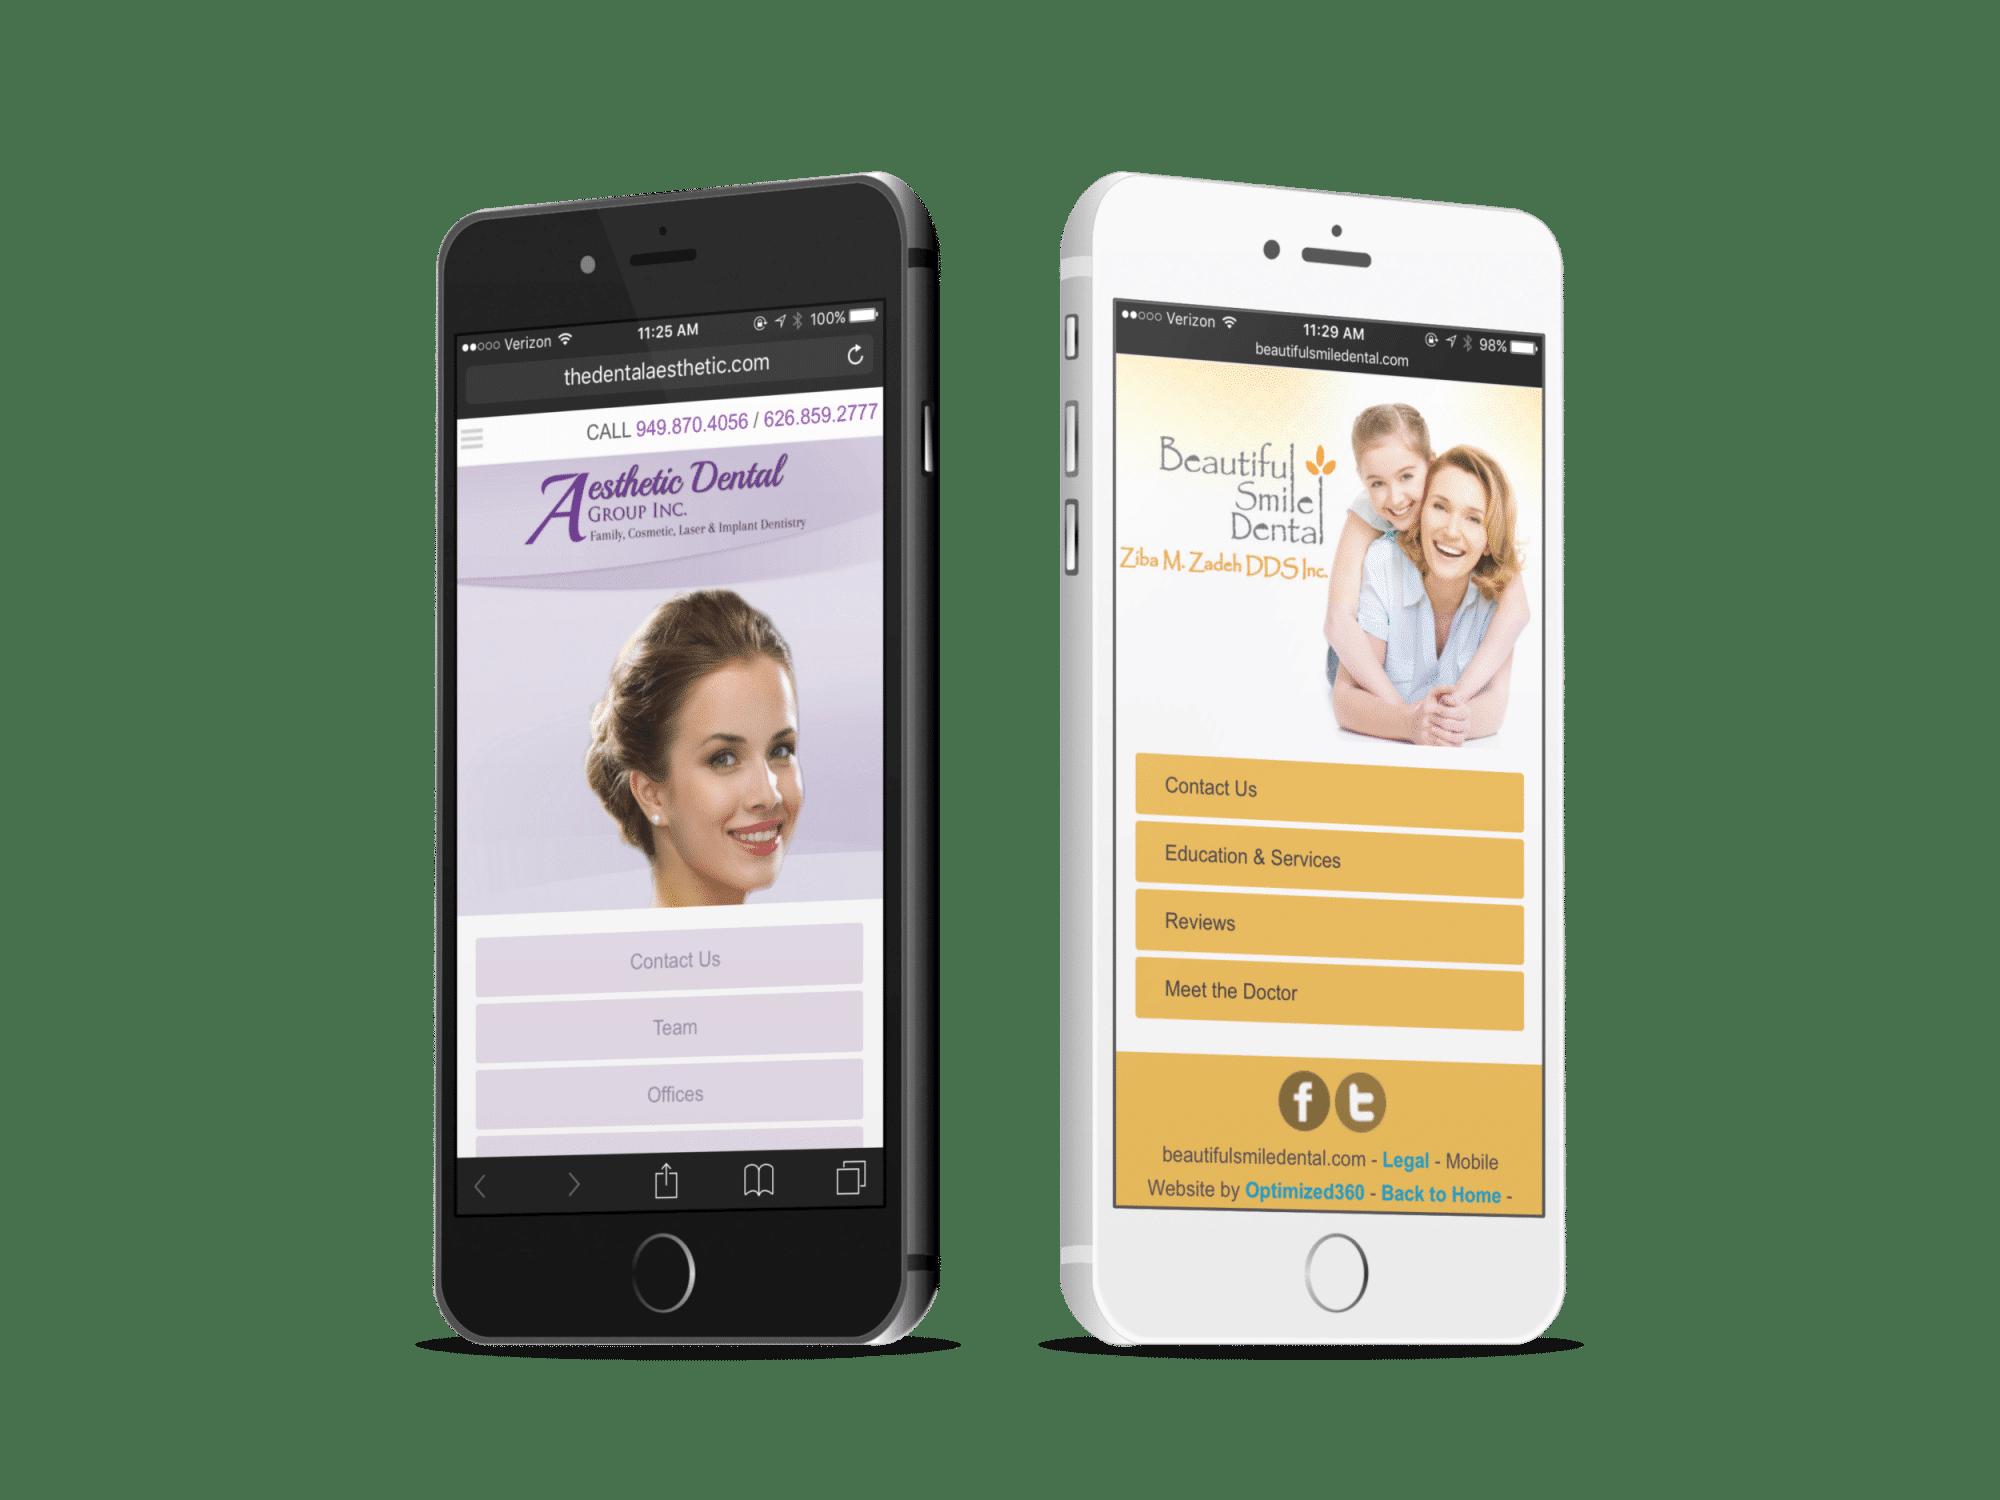 Two Prosthodontic Mobile Websites